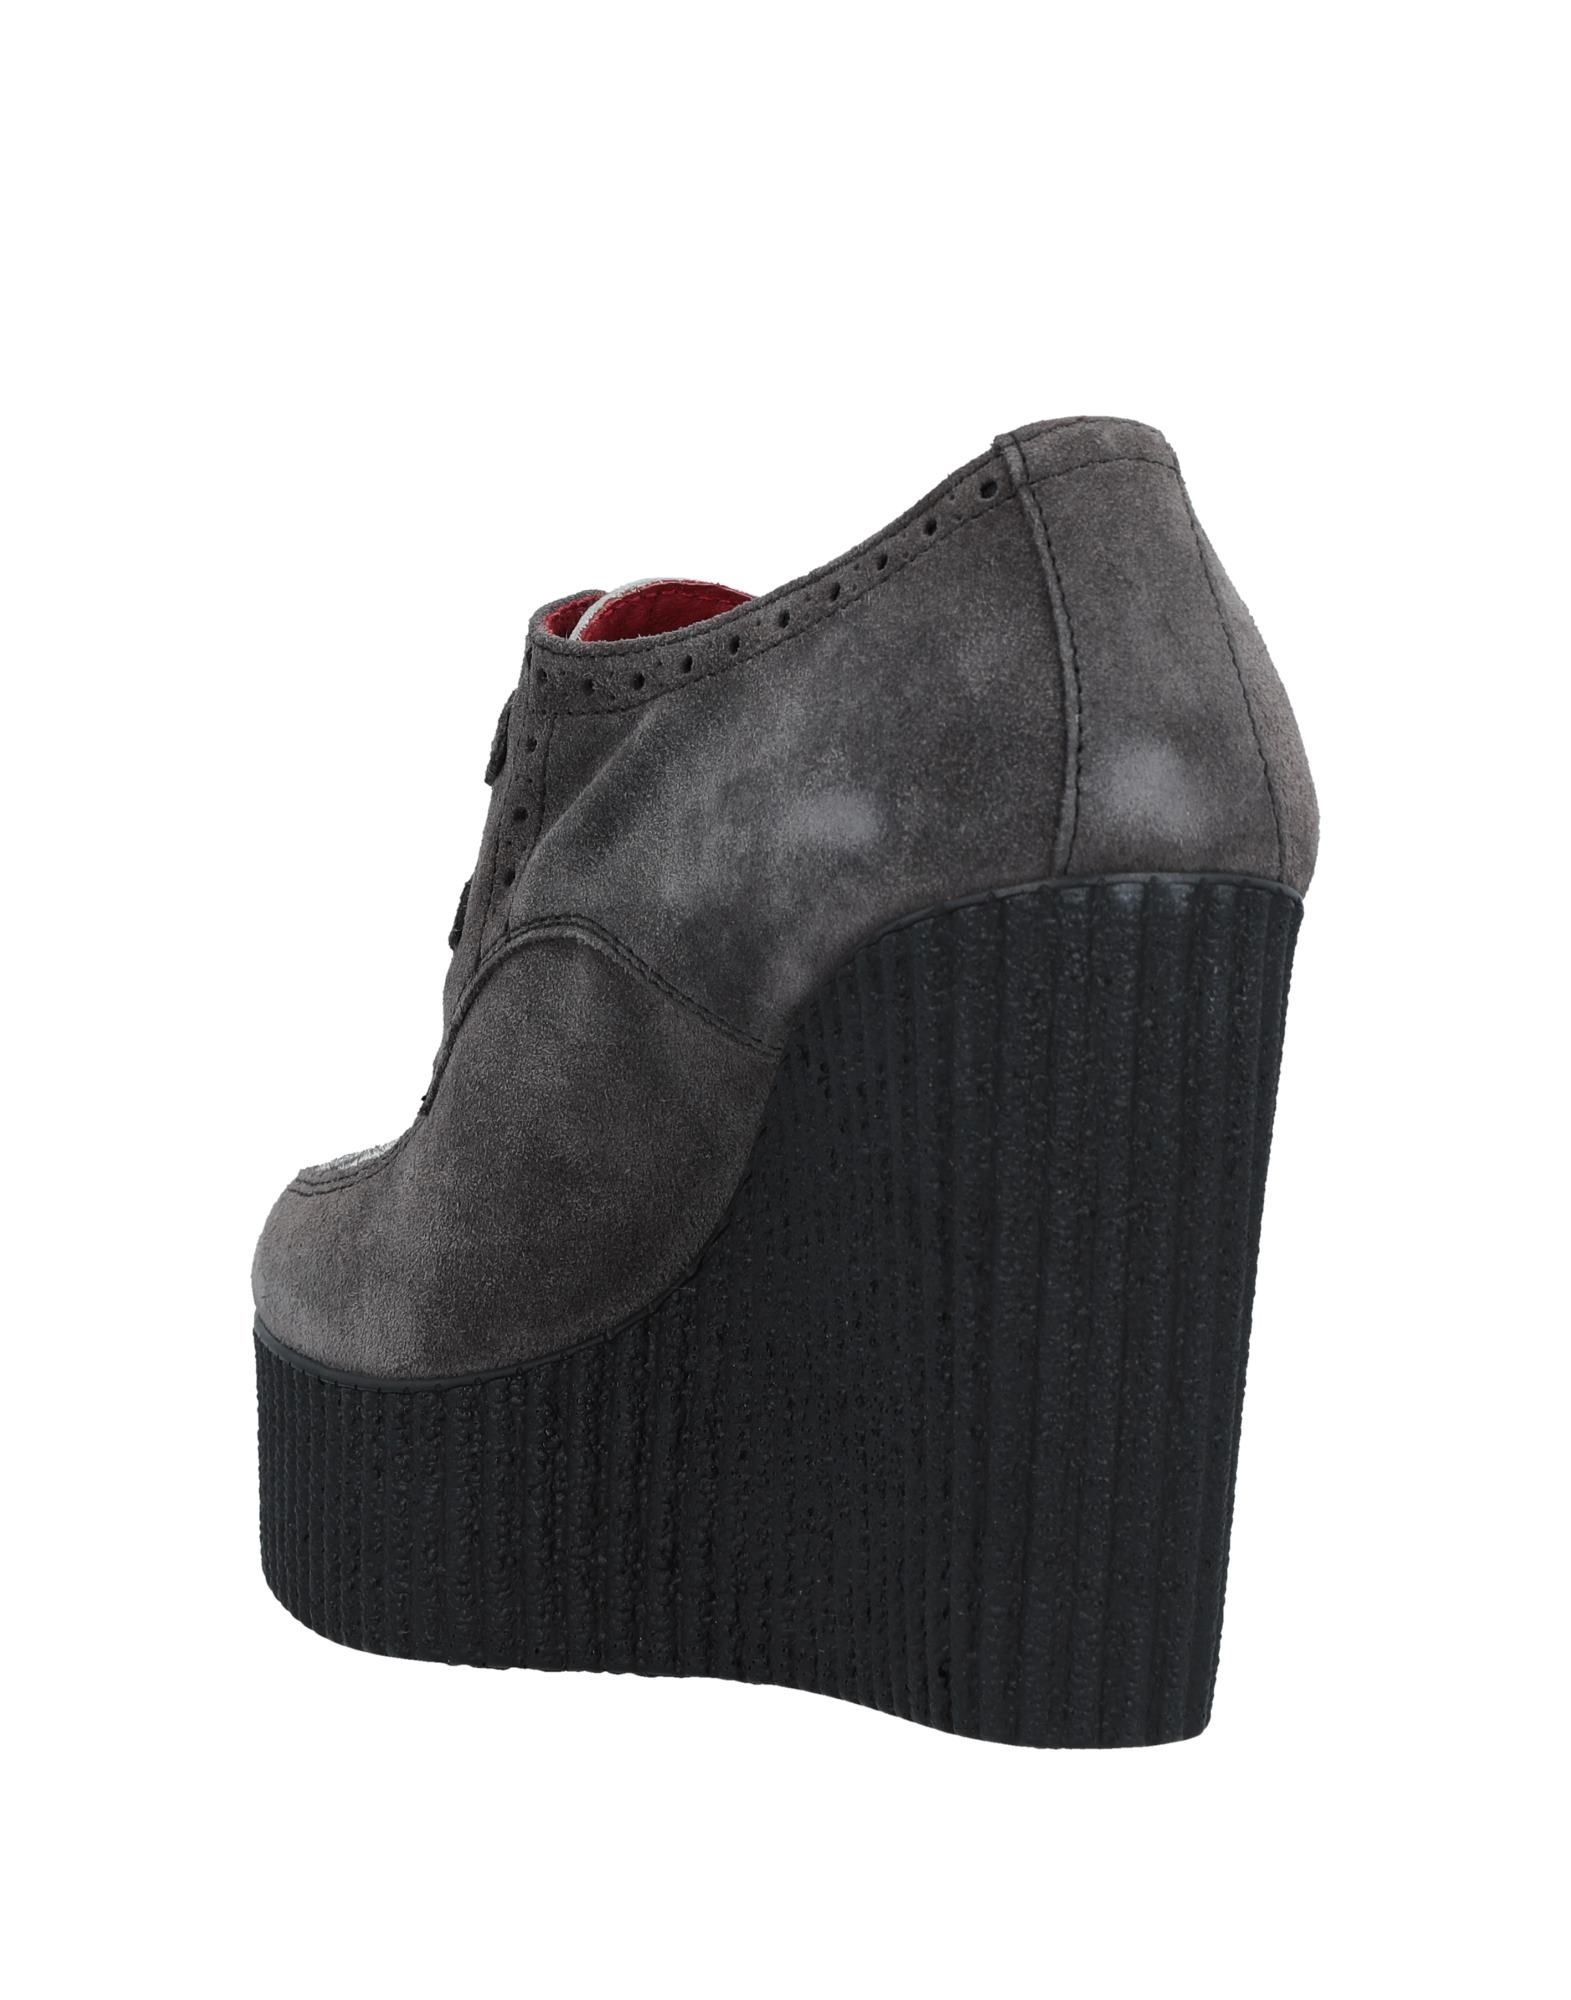 Maison Zero Q Schnürschuhe Damen  11523367AM Gute Qualität beliebte Schuhe